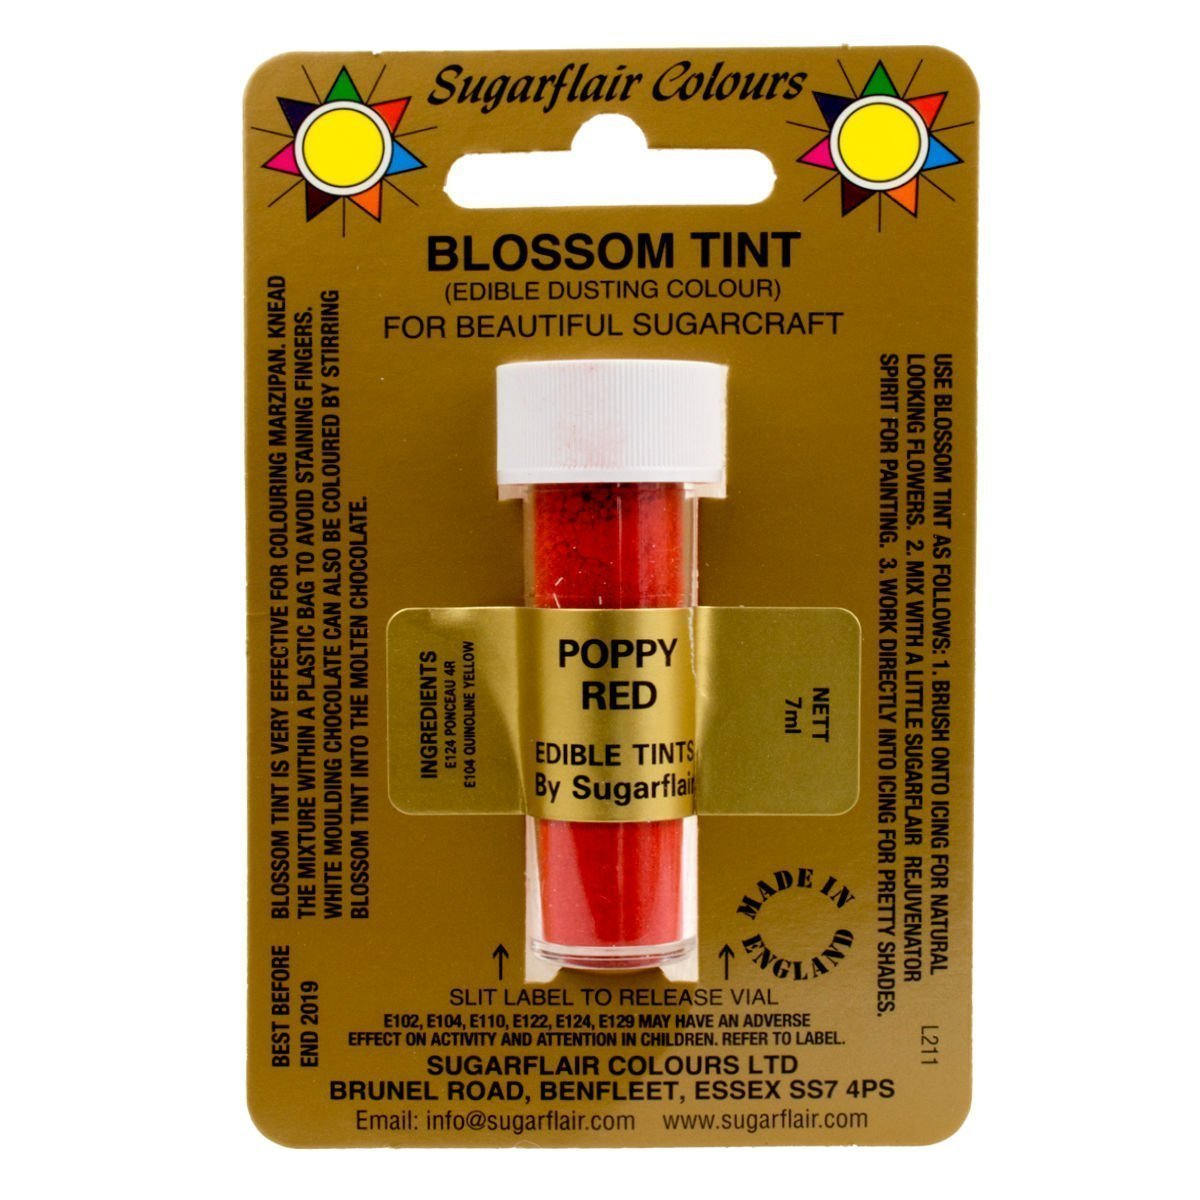 Sugarcraft Sugarflair Colour Blossom Tint Powder Dust Poppy Red 7ml